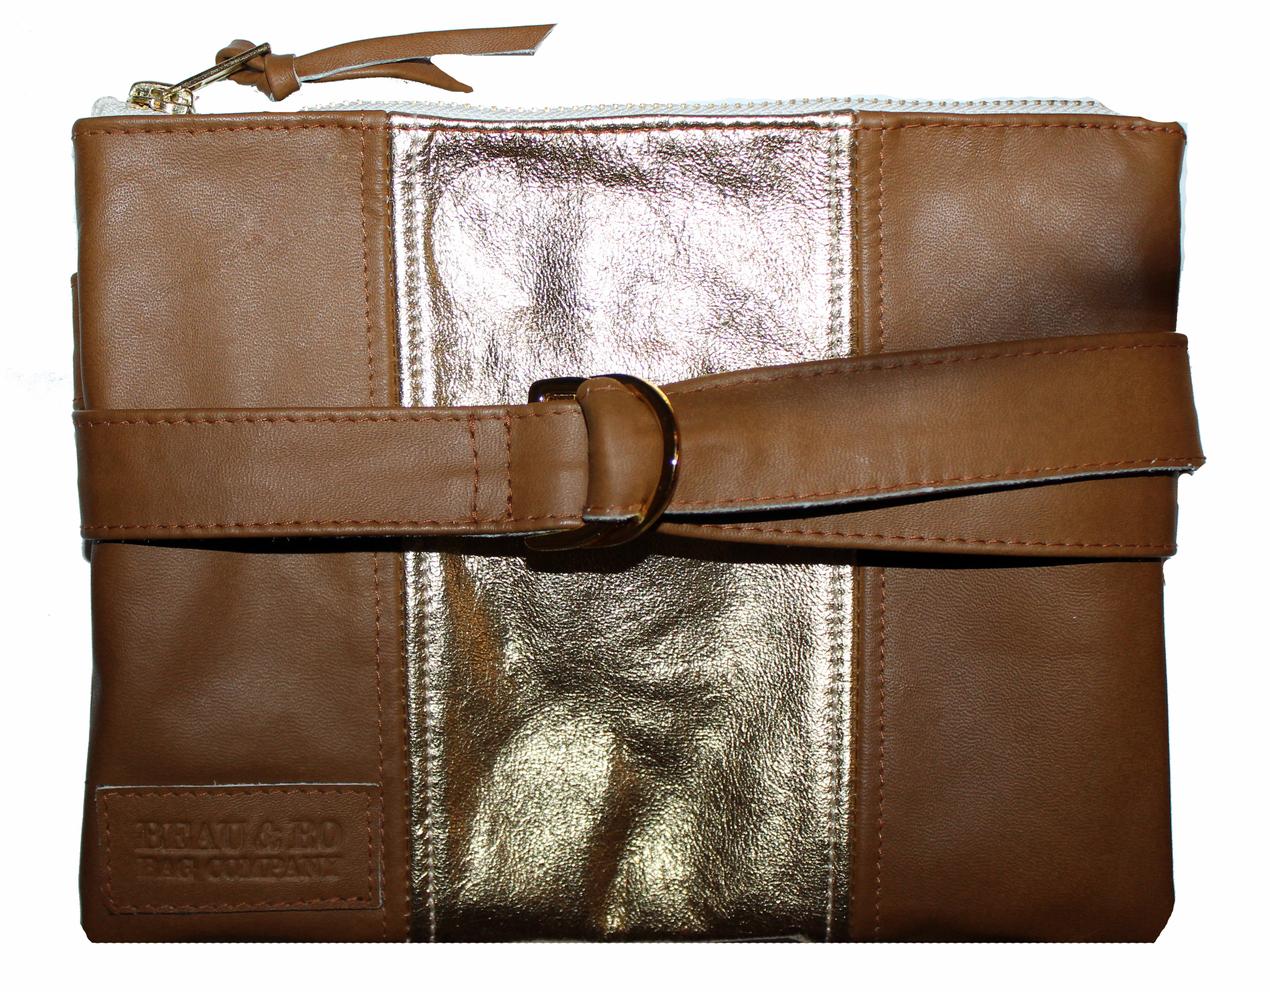 Beau & Ro Amangensett Belt Bag